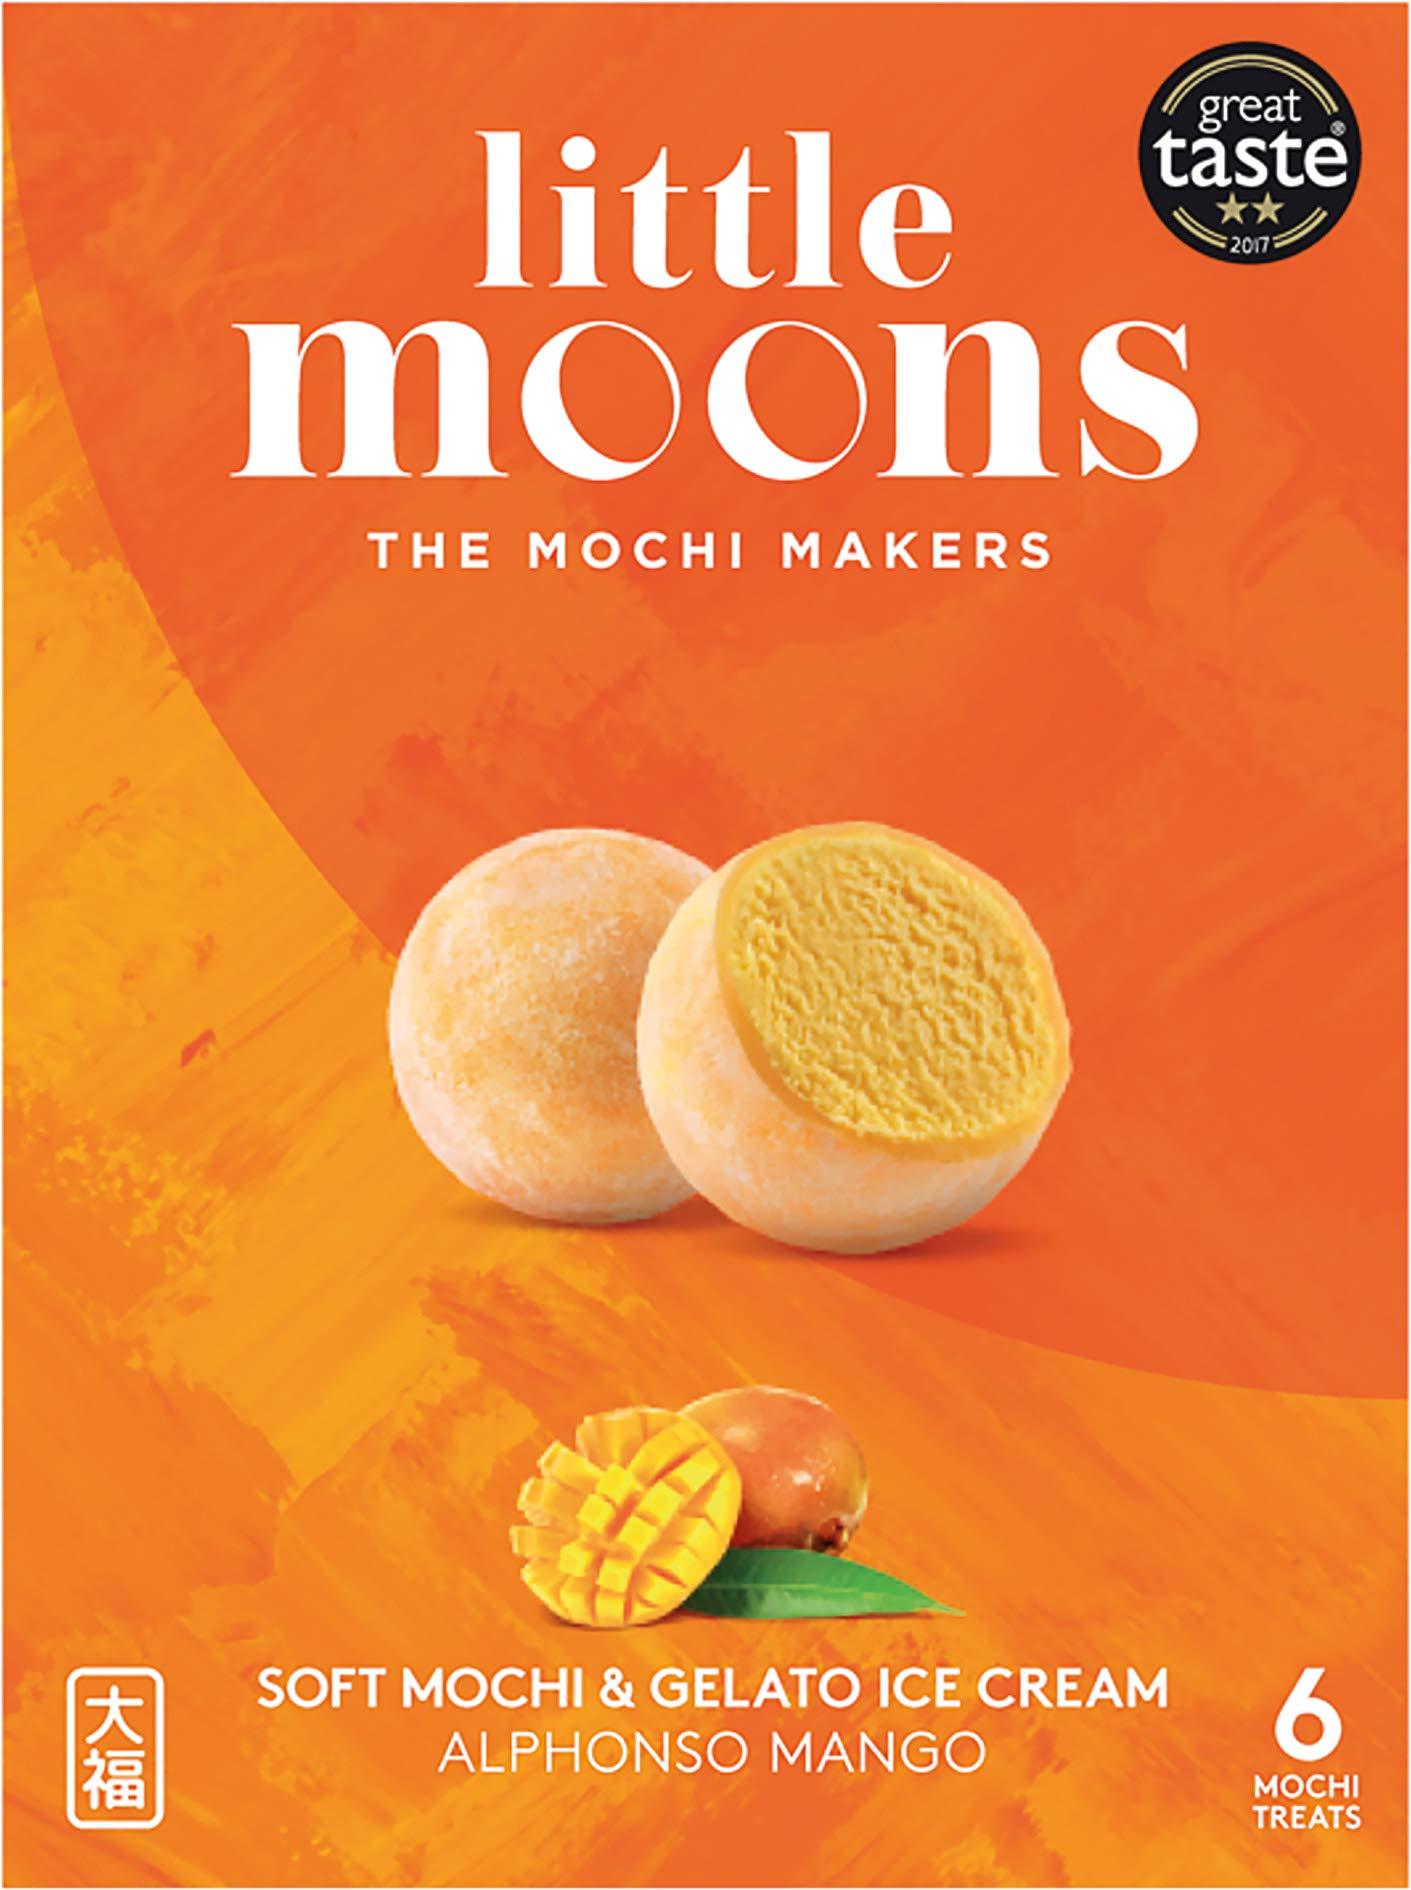 Little Moons Alphonso Mango Mochi Ice Cream, 6 x 32g (Frozen)